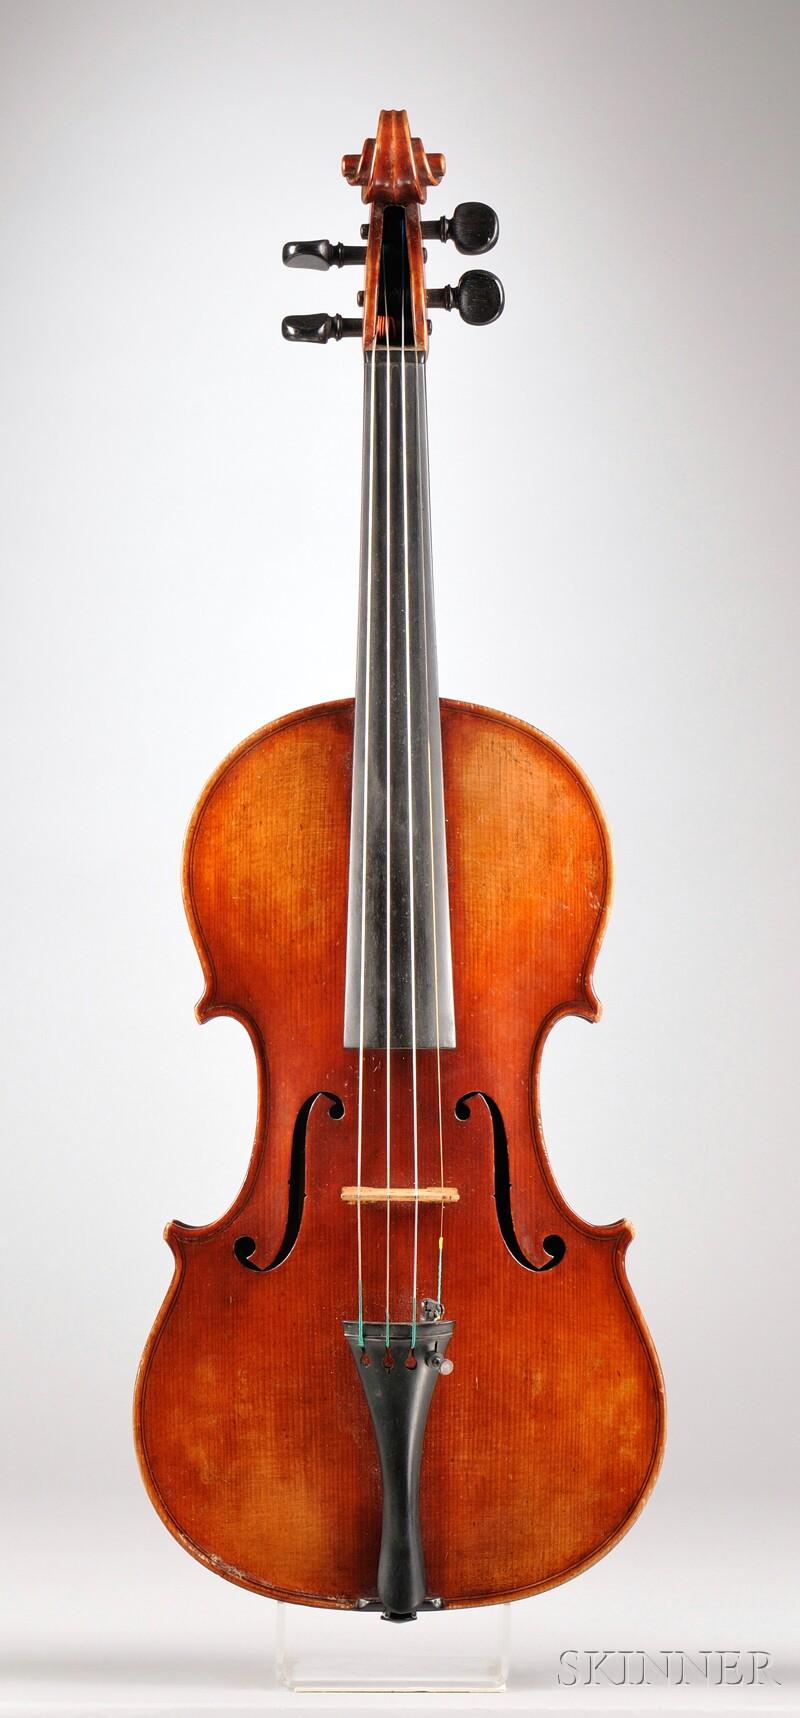 American Violin, Orin Weeman, Boston, 1904